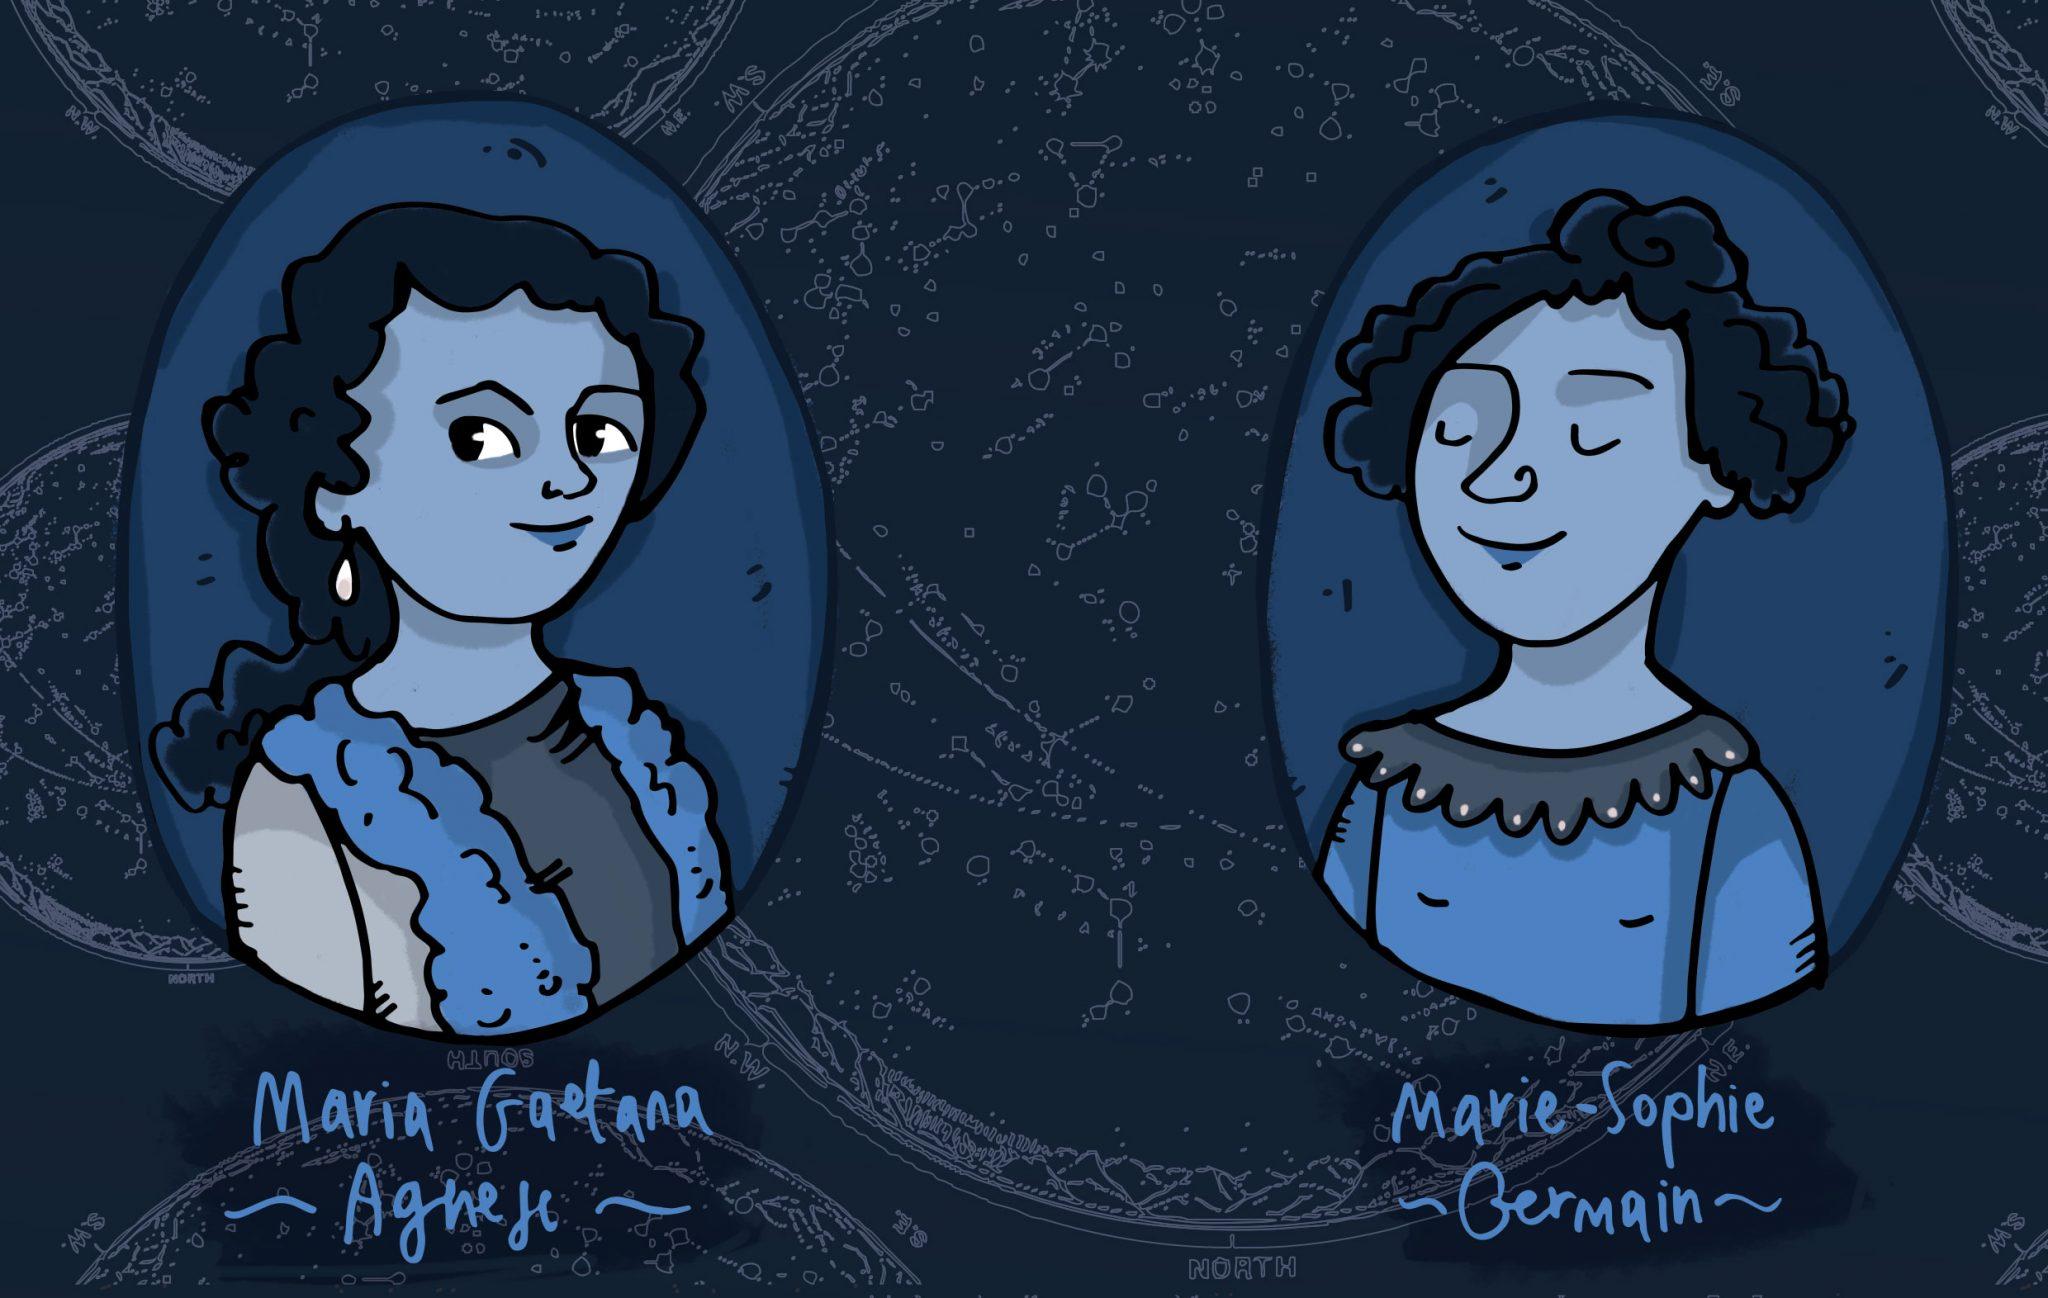 Maria-Gaetana-Agnesi-Marie-Sophie-Germain